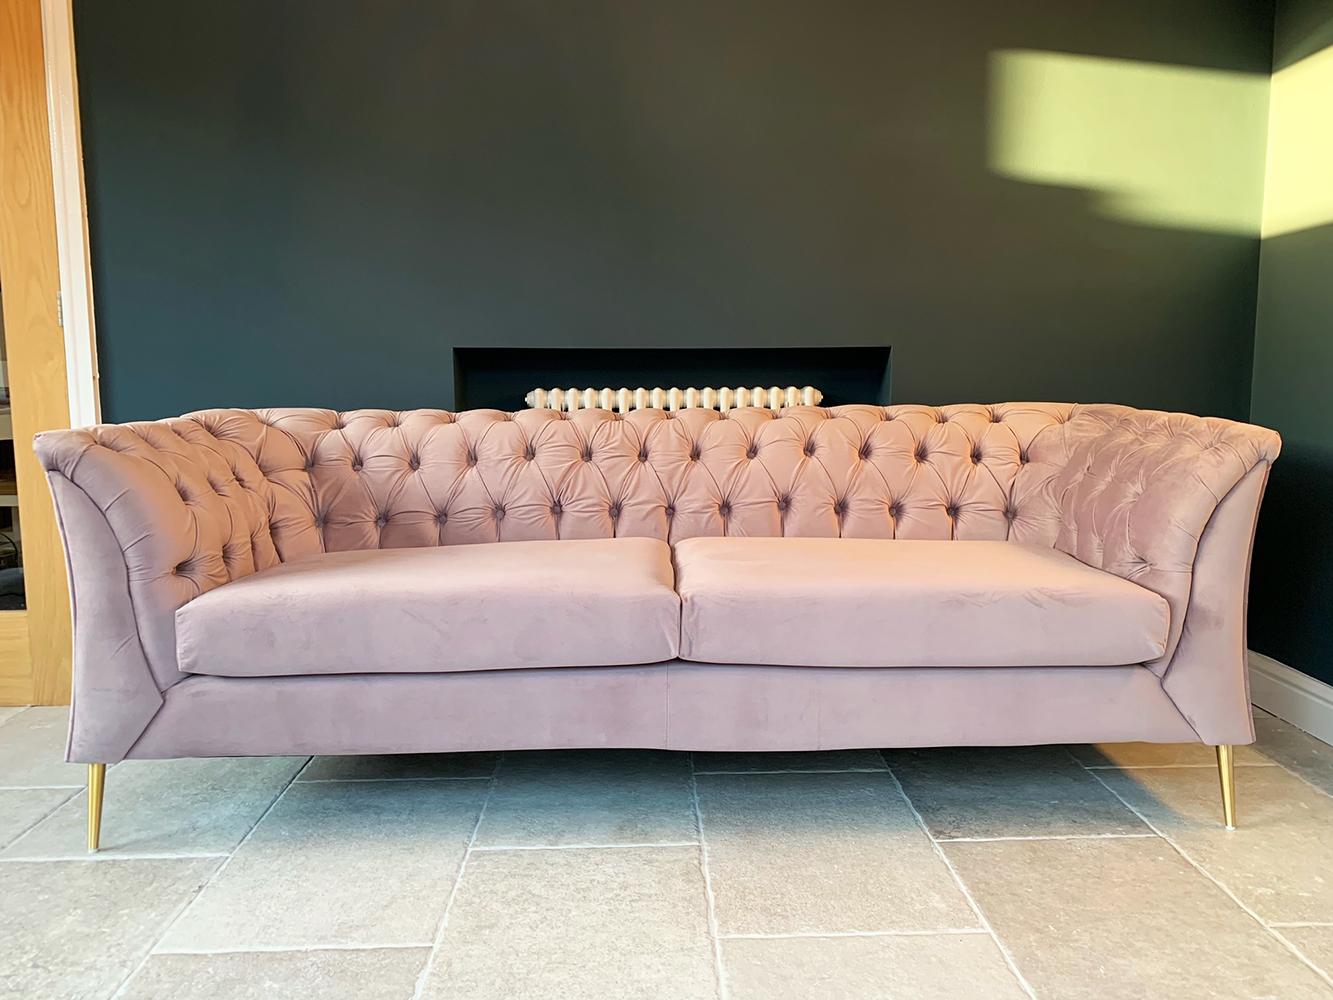 Lilac sofa Chesterfield Modern, velour material, gold legs